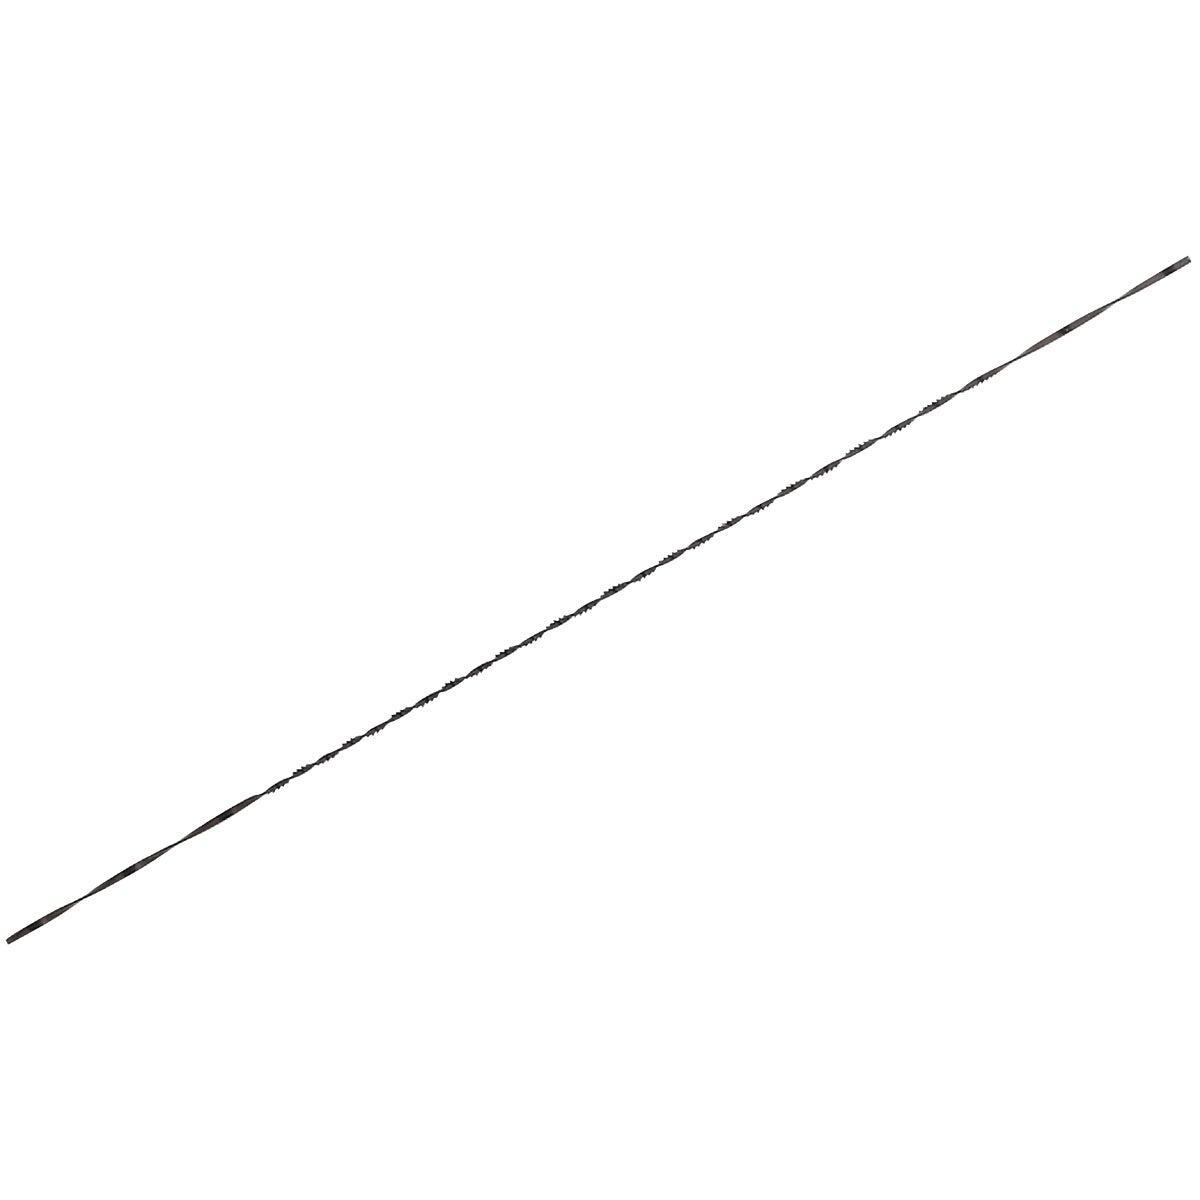 41Tpi Scroll Saw Blade